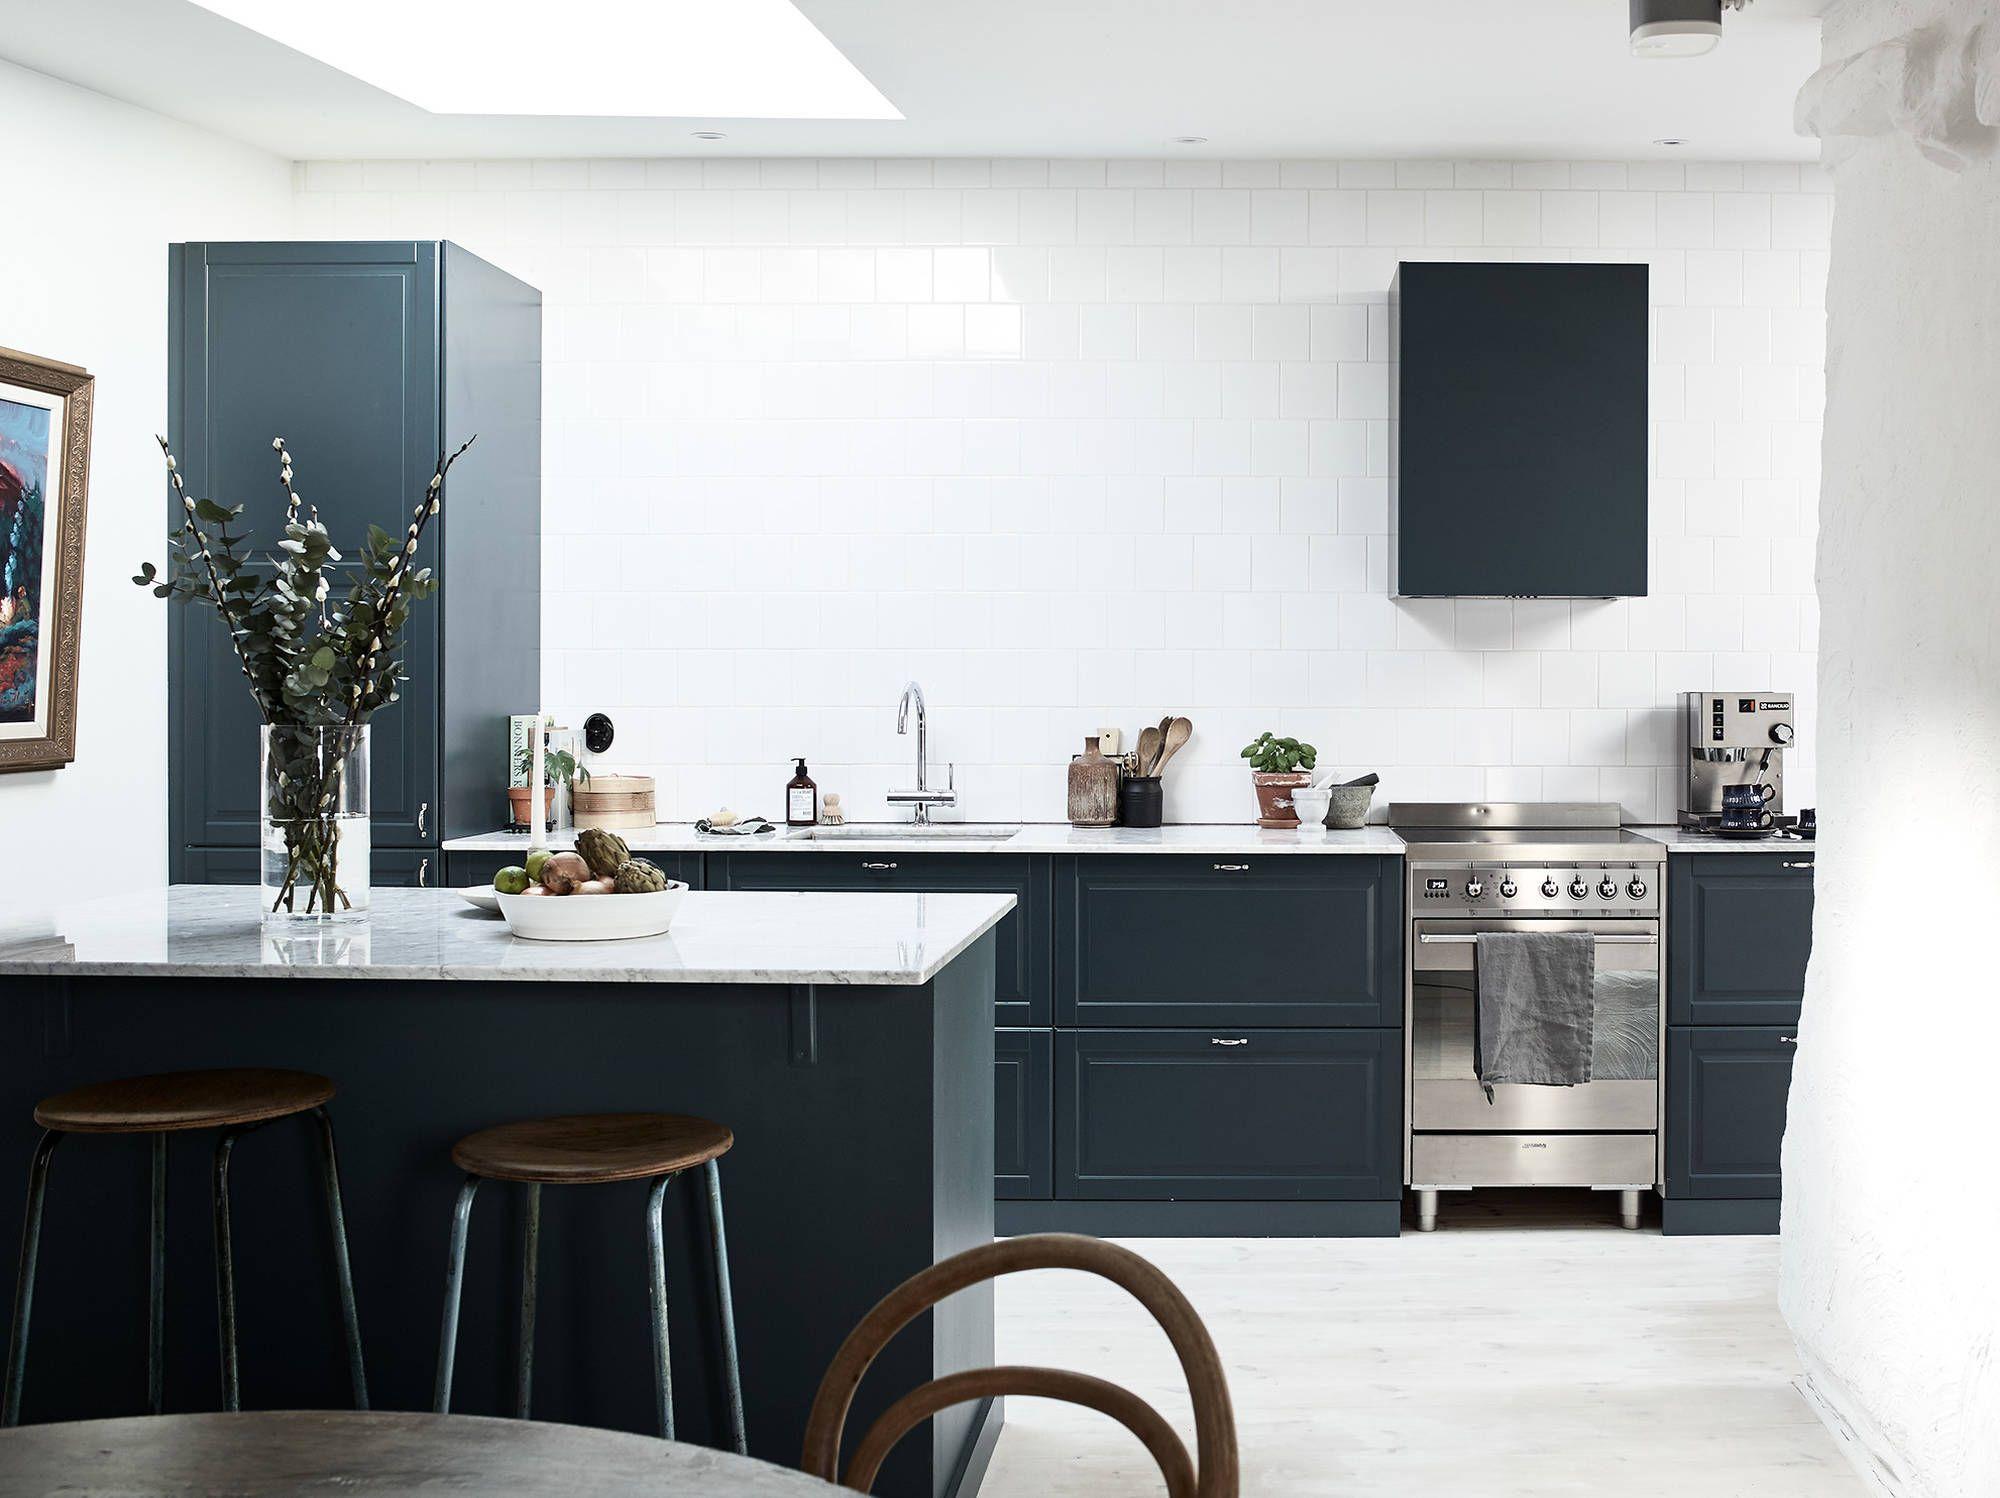 Nyrenoverad Vindslagenhet Med Social Planlosning Till Accepterat Pris Stadshem Kitchen Inspiration Design Blue Kitchen Interior Grey Marble Kitchen